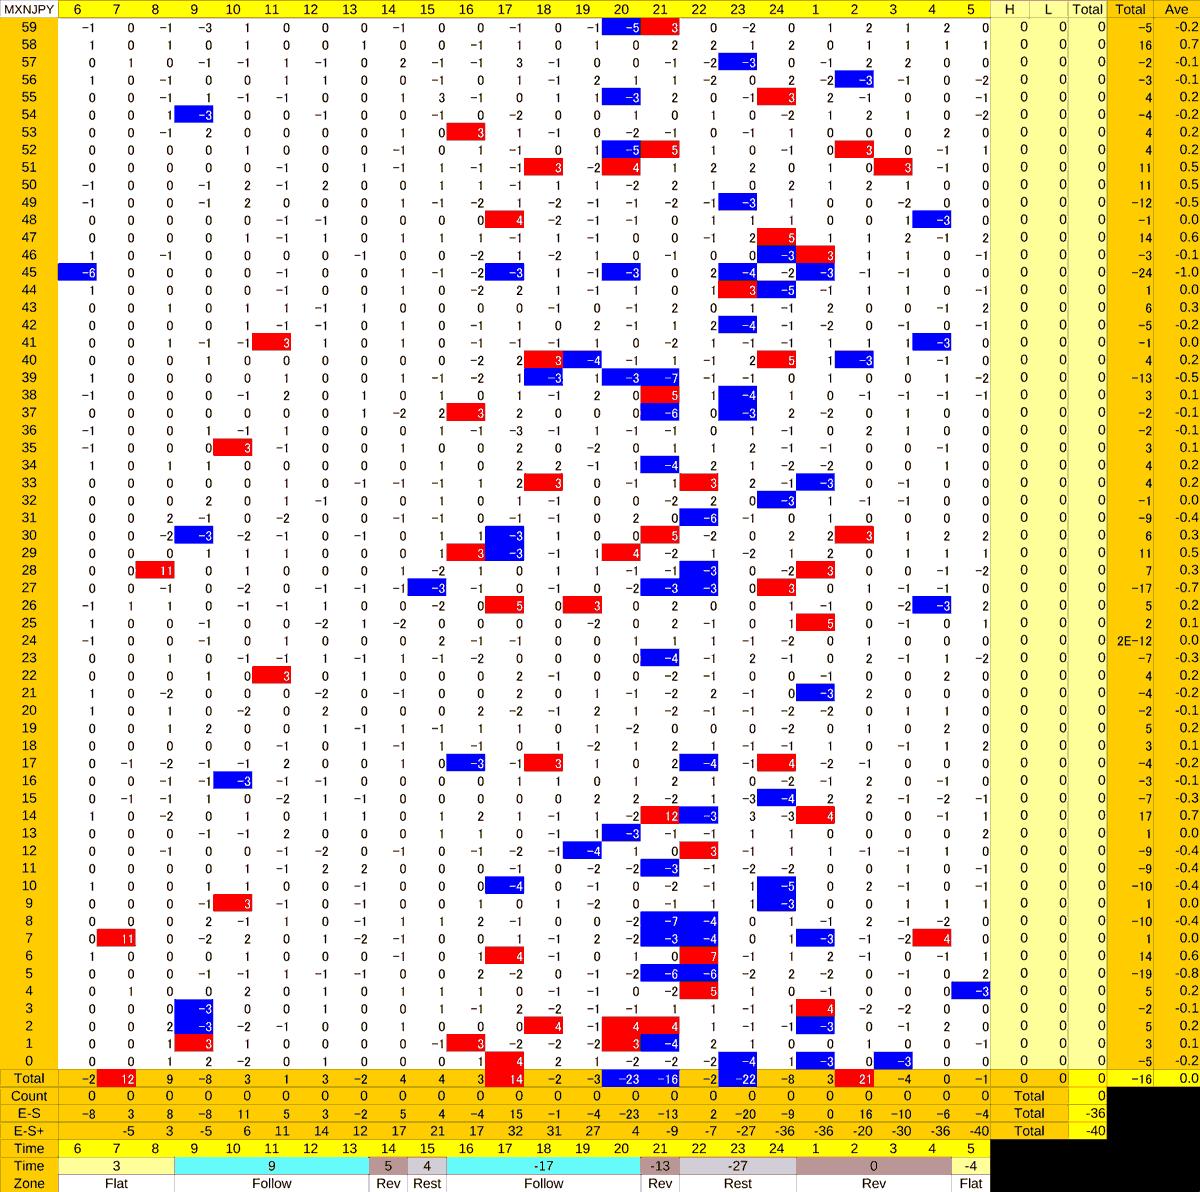 20201111_HS(3)MXNJPY